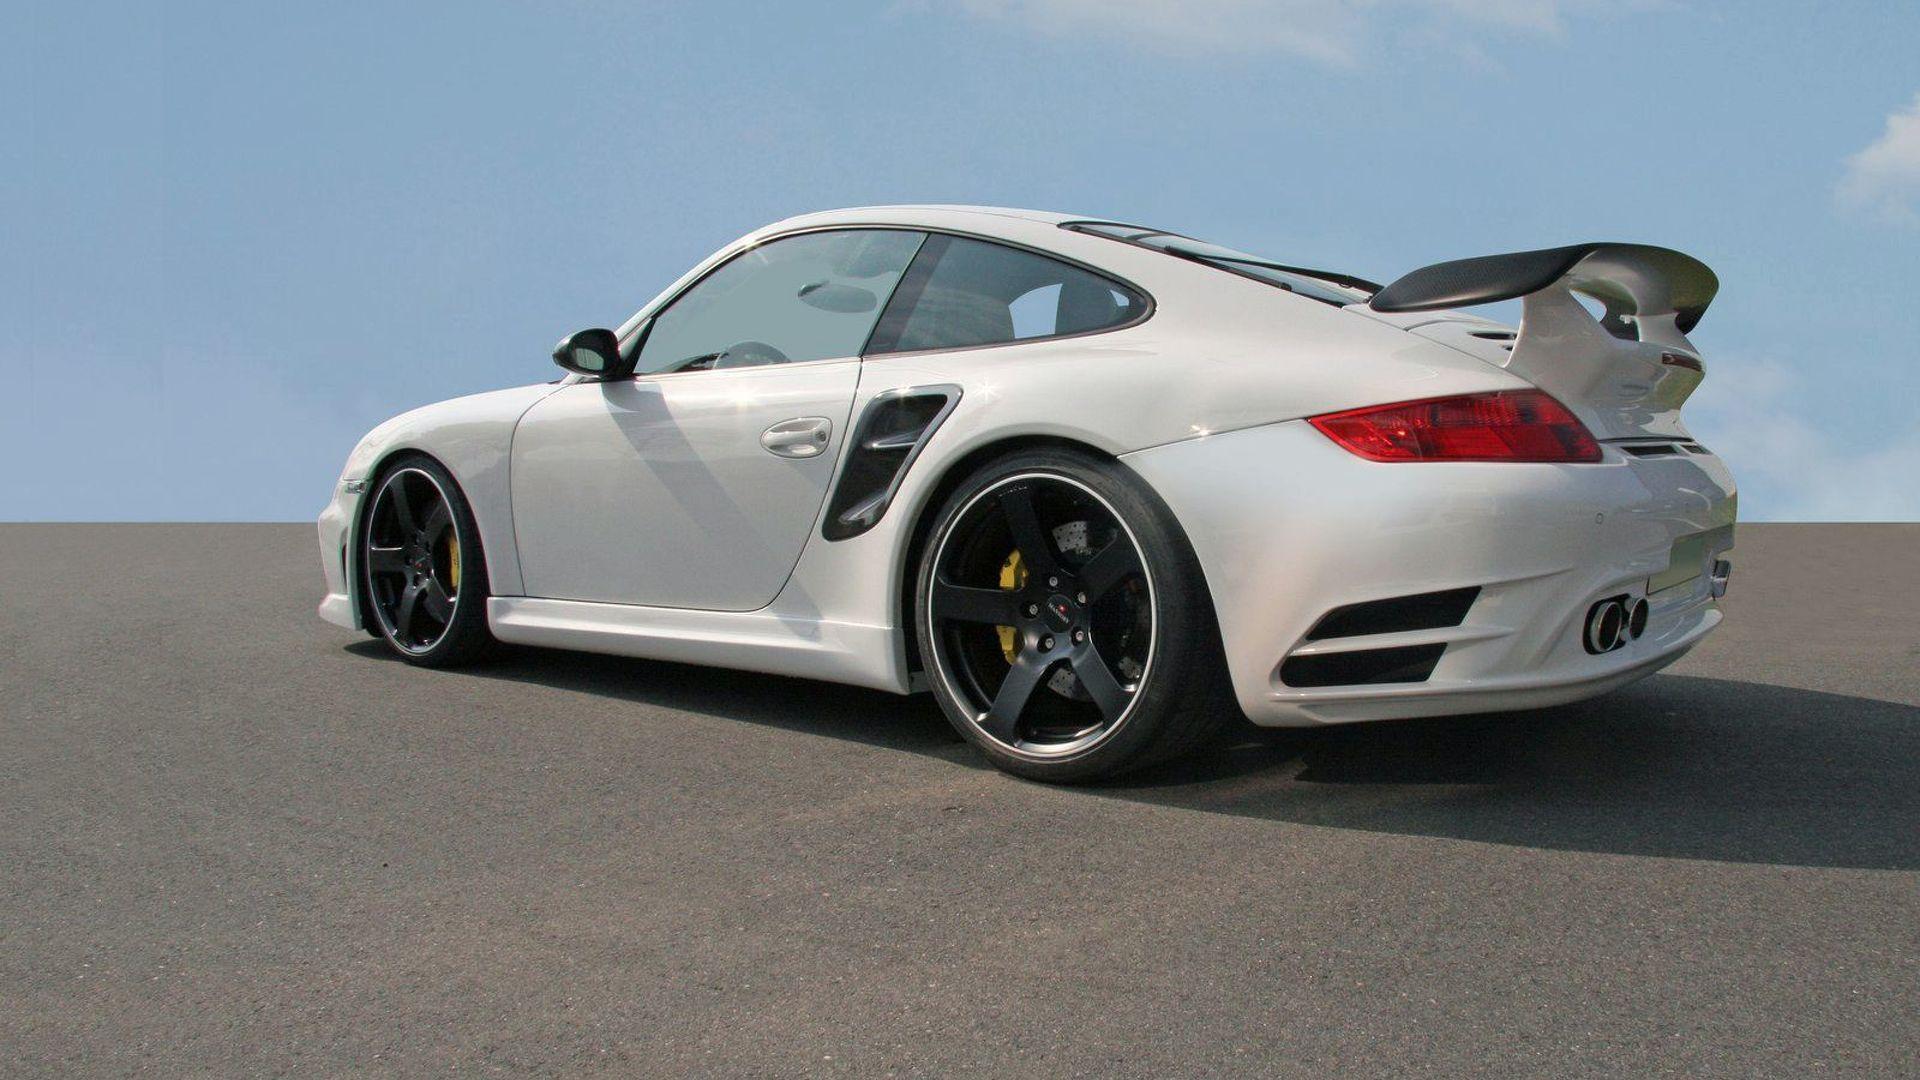 Porsche 997 Turbo >> Mansory Releases Tuning Program For Porsche 997 Turbo